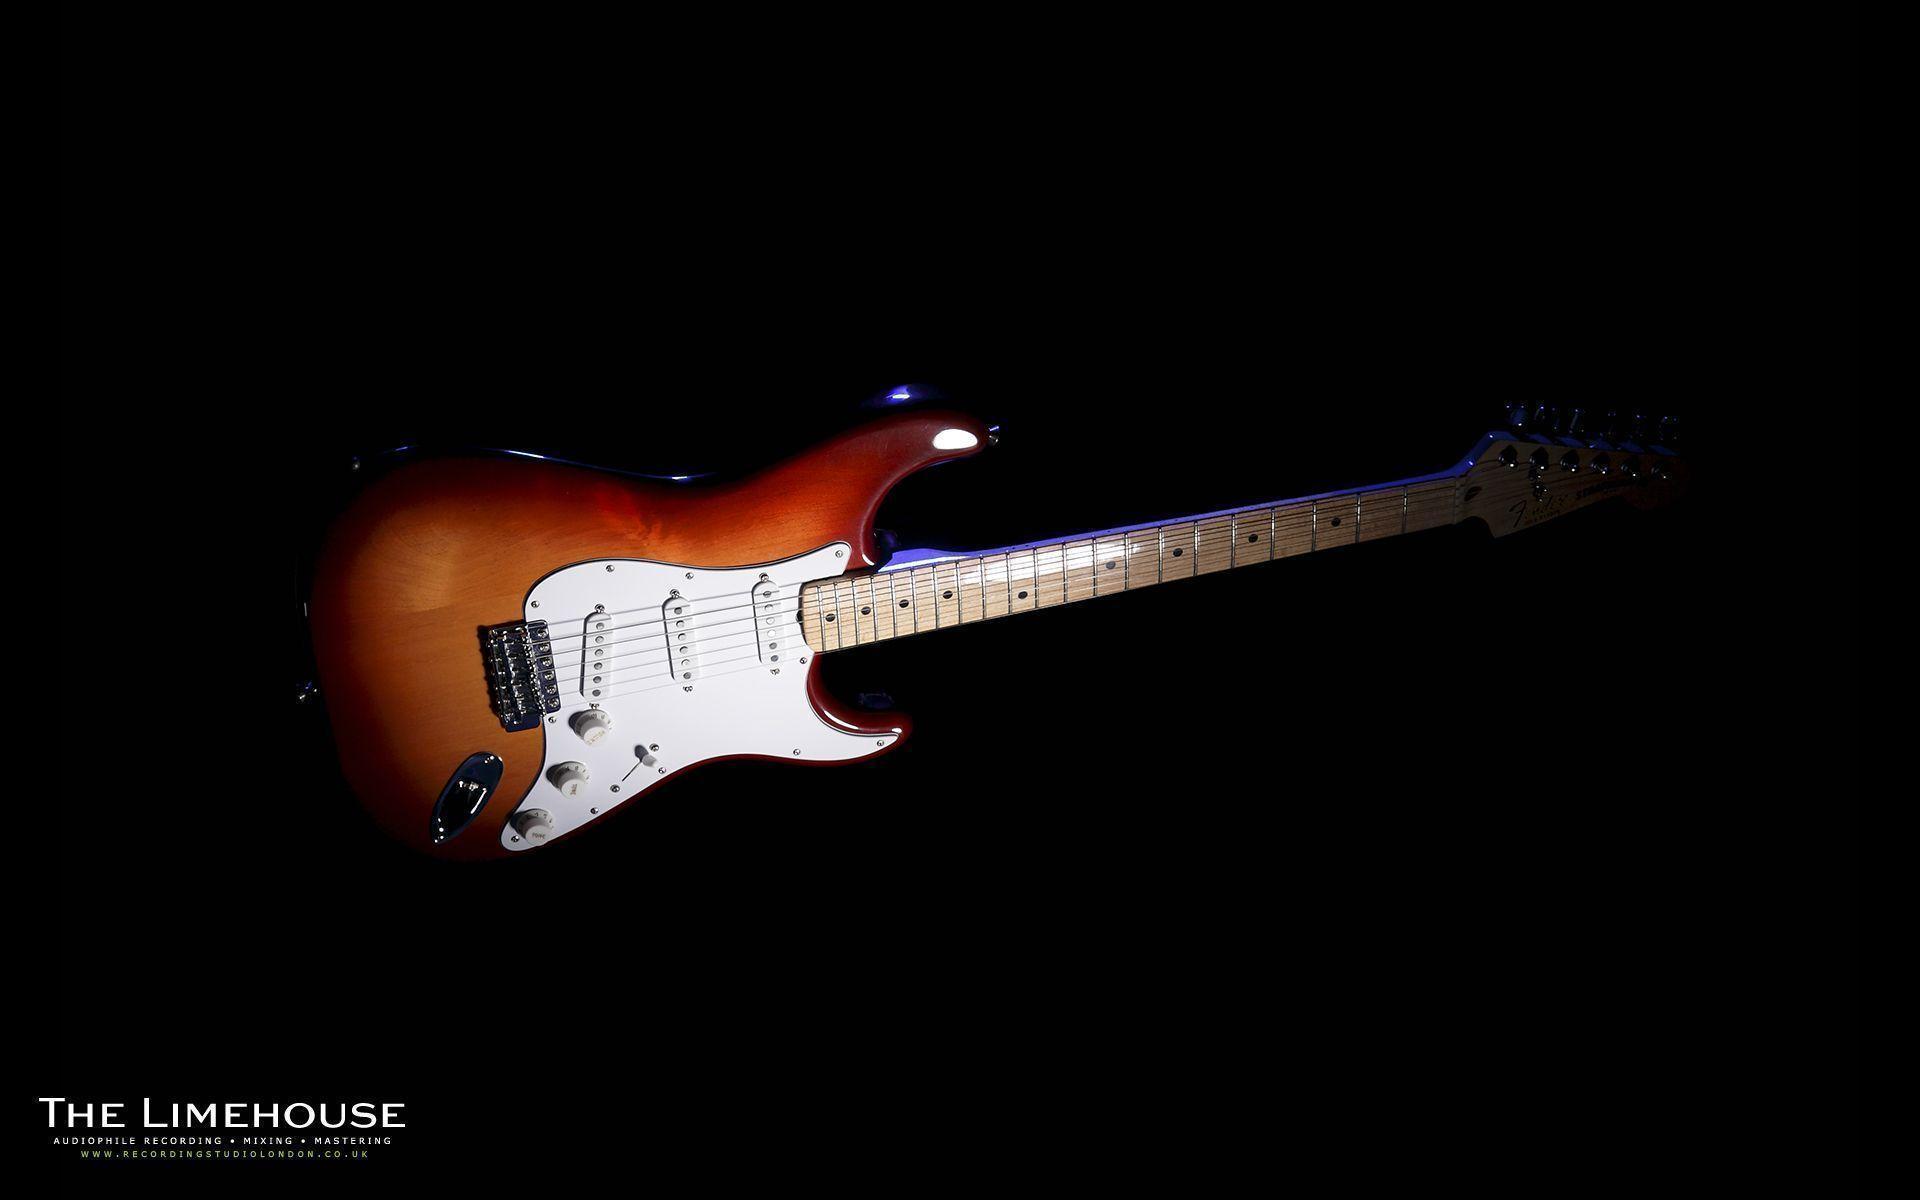 guitar wallpaper widescreen - photo #13